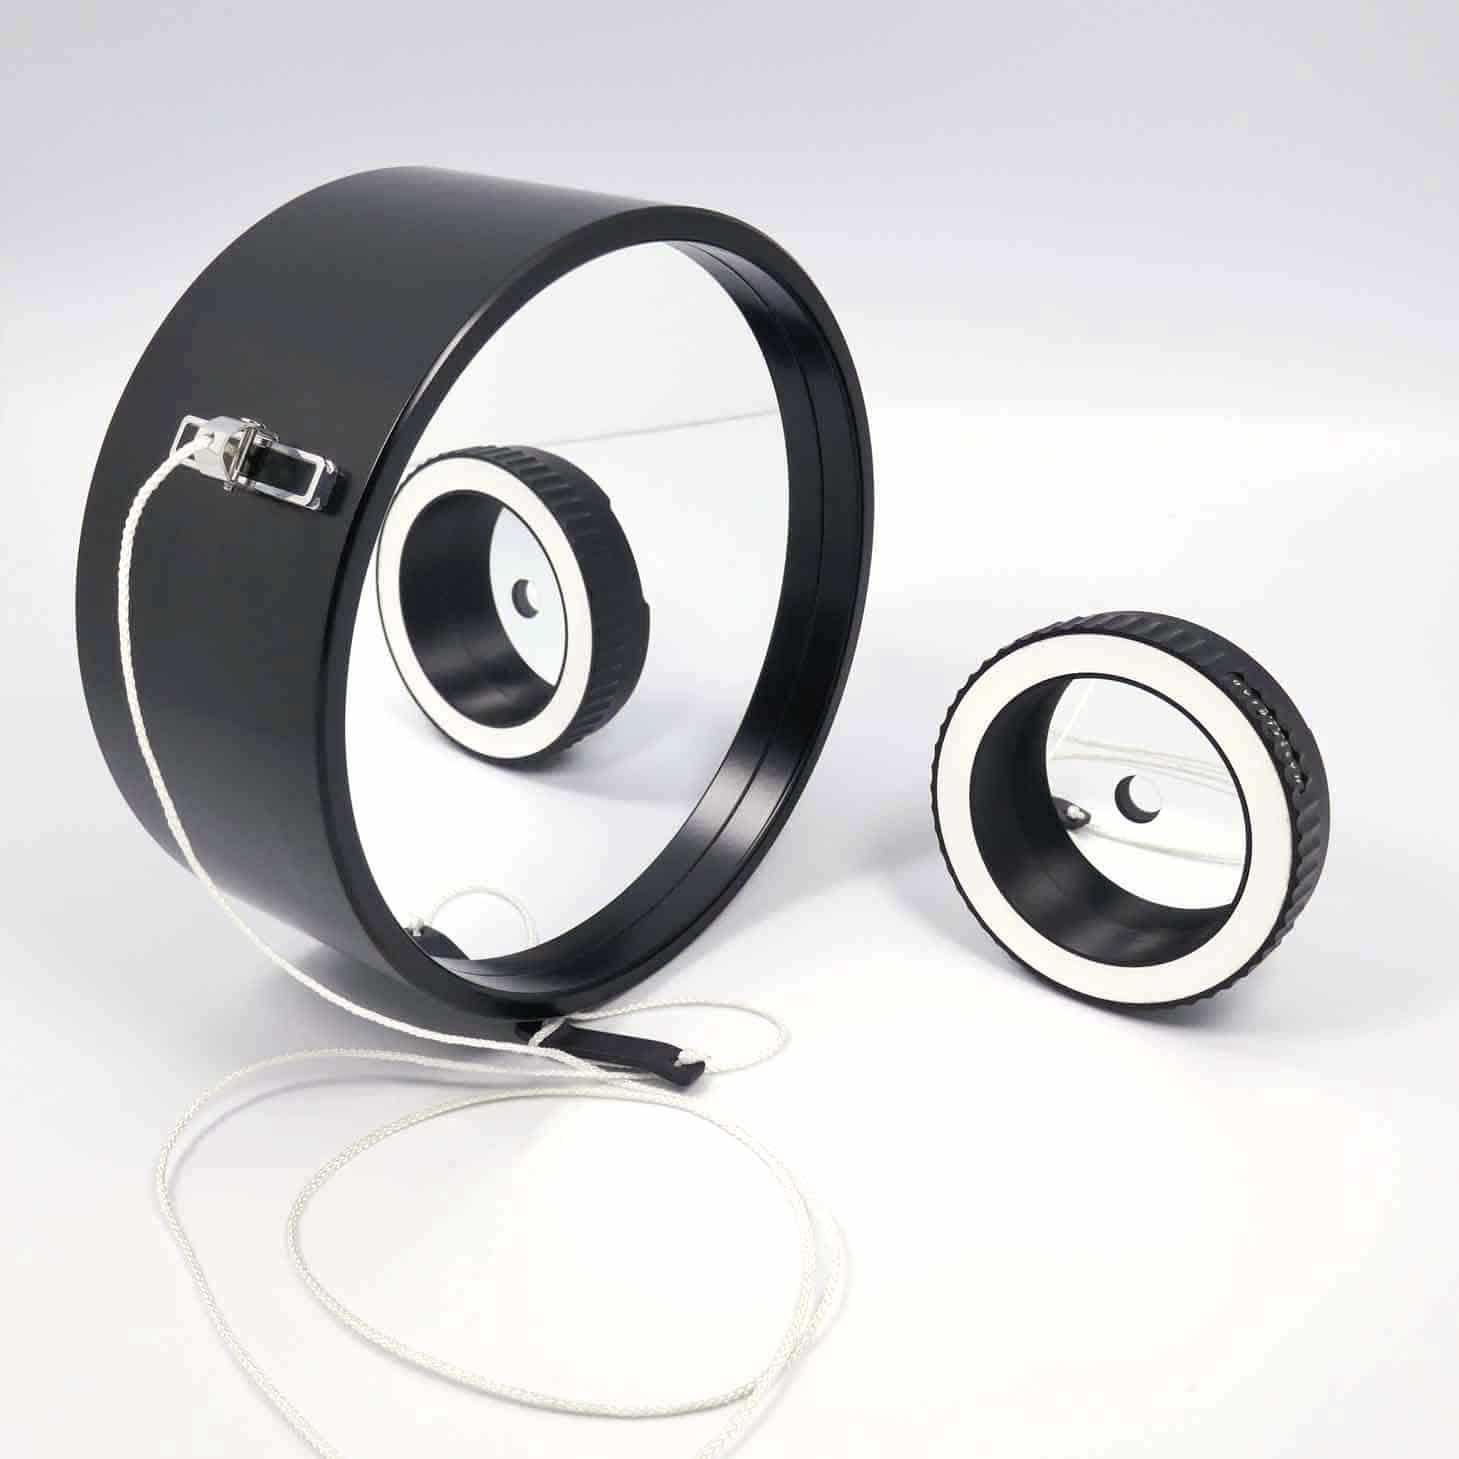 clean-cameras-Hasselblad-Mirror-Unit-40185---01